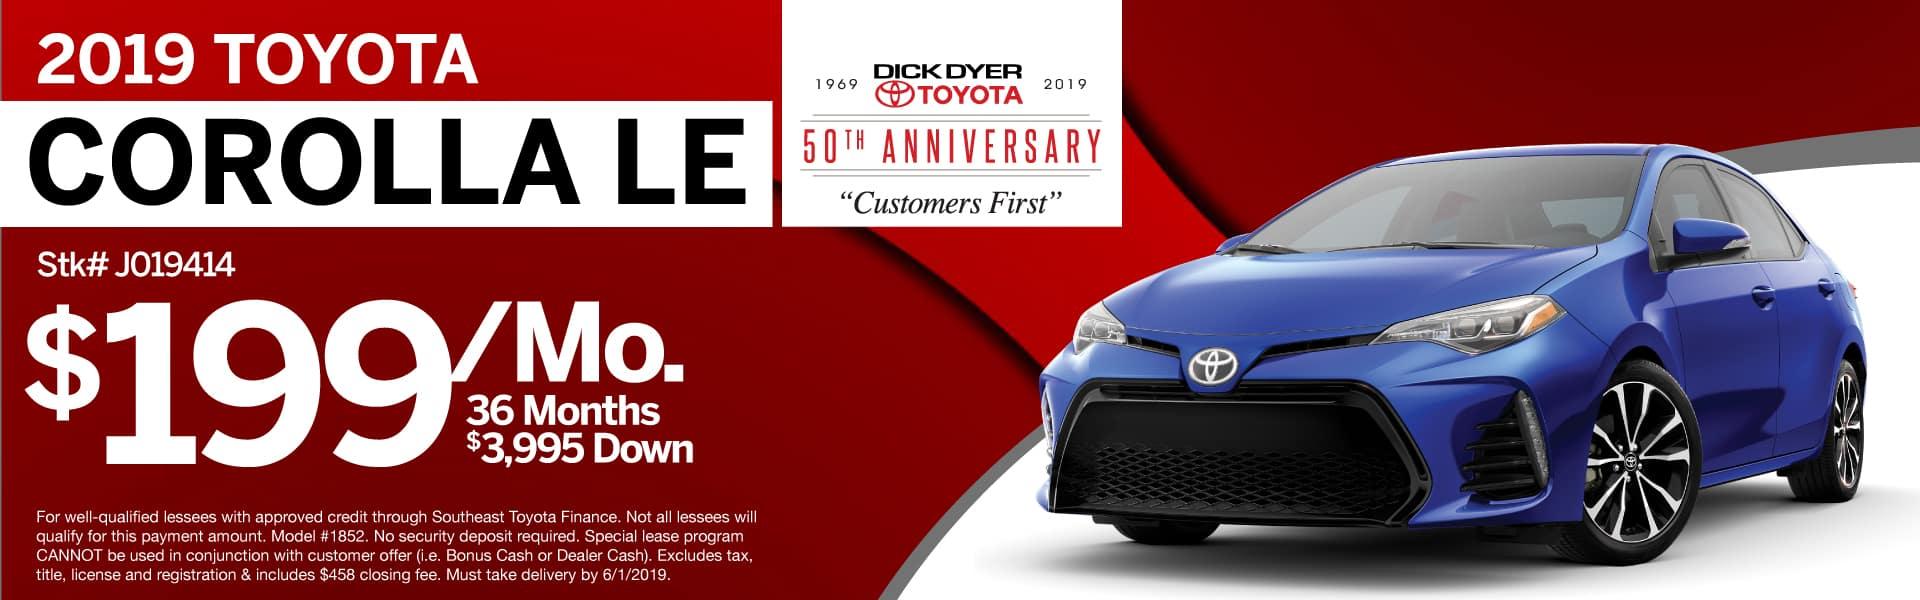 2019 Toyota Corolla Sale